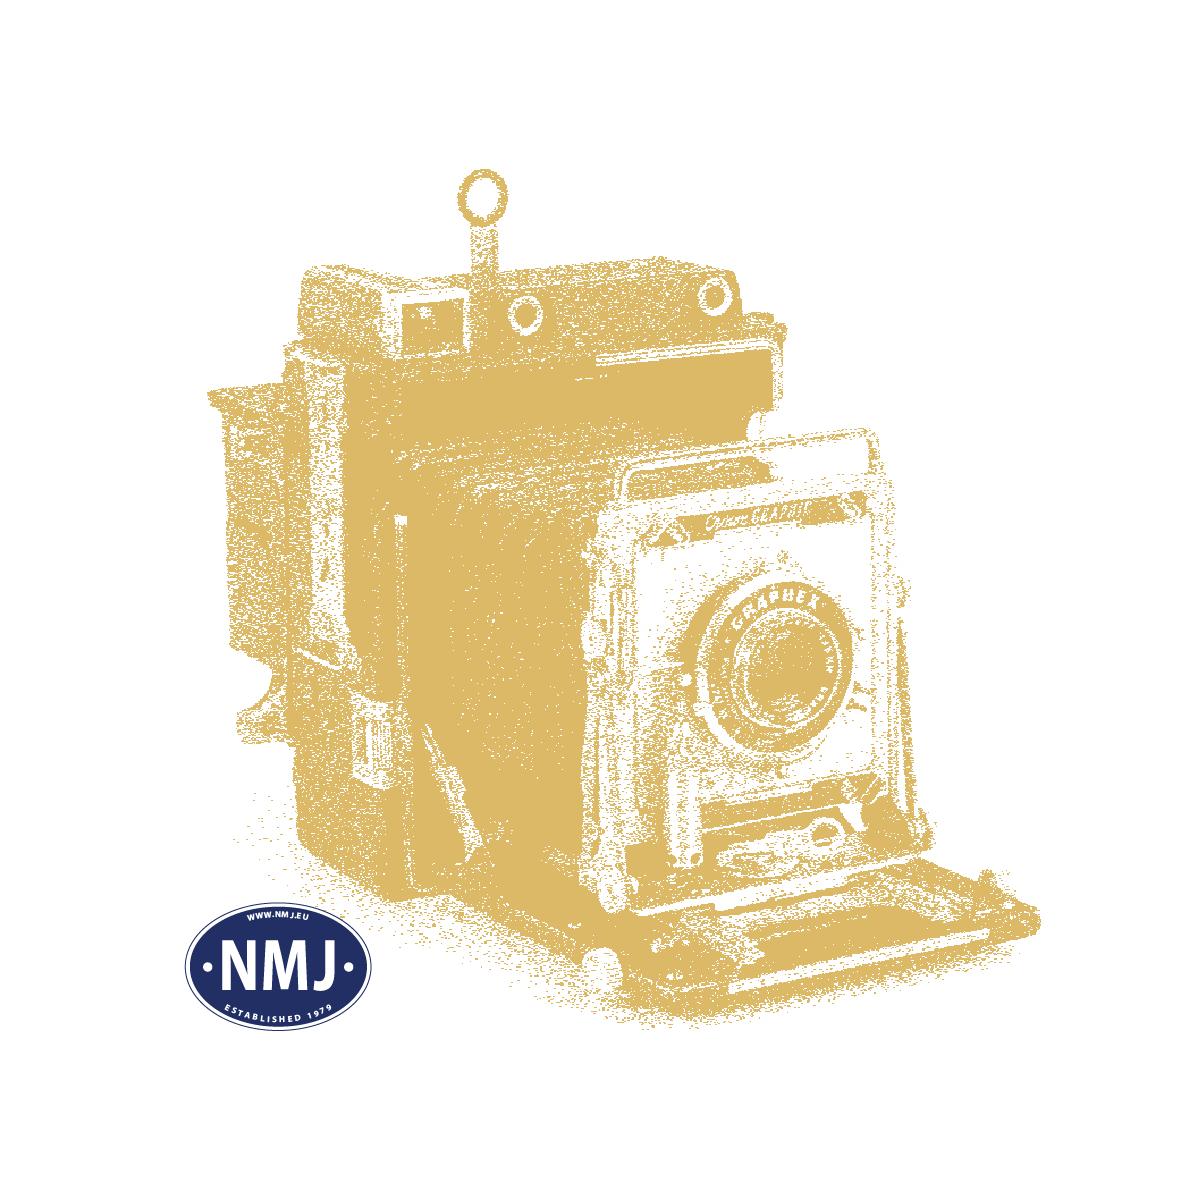 NMJT90203 - NMJ Topline MAV M61.006, DC